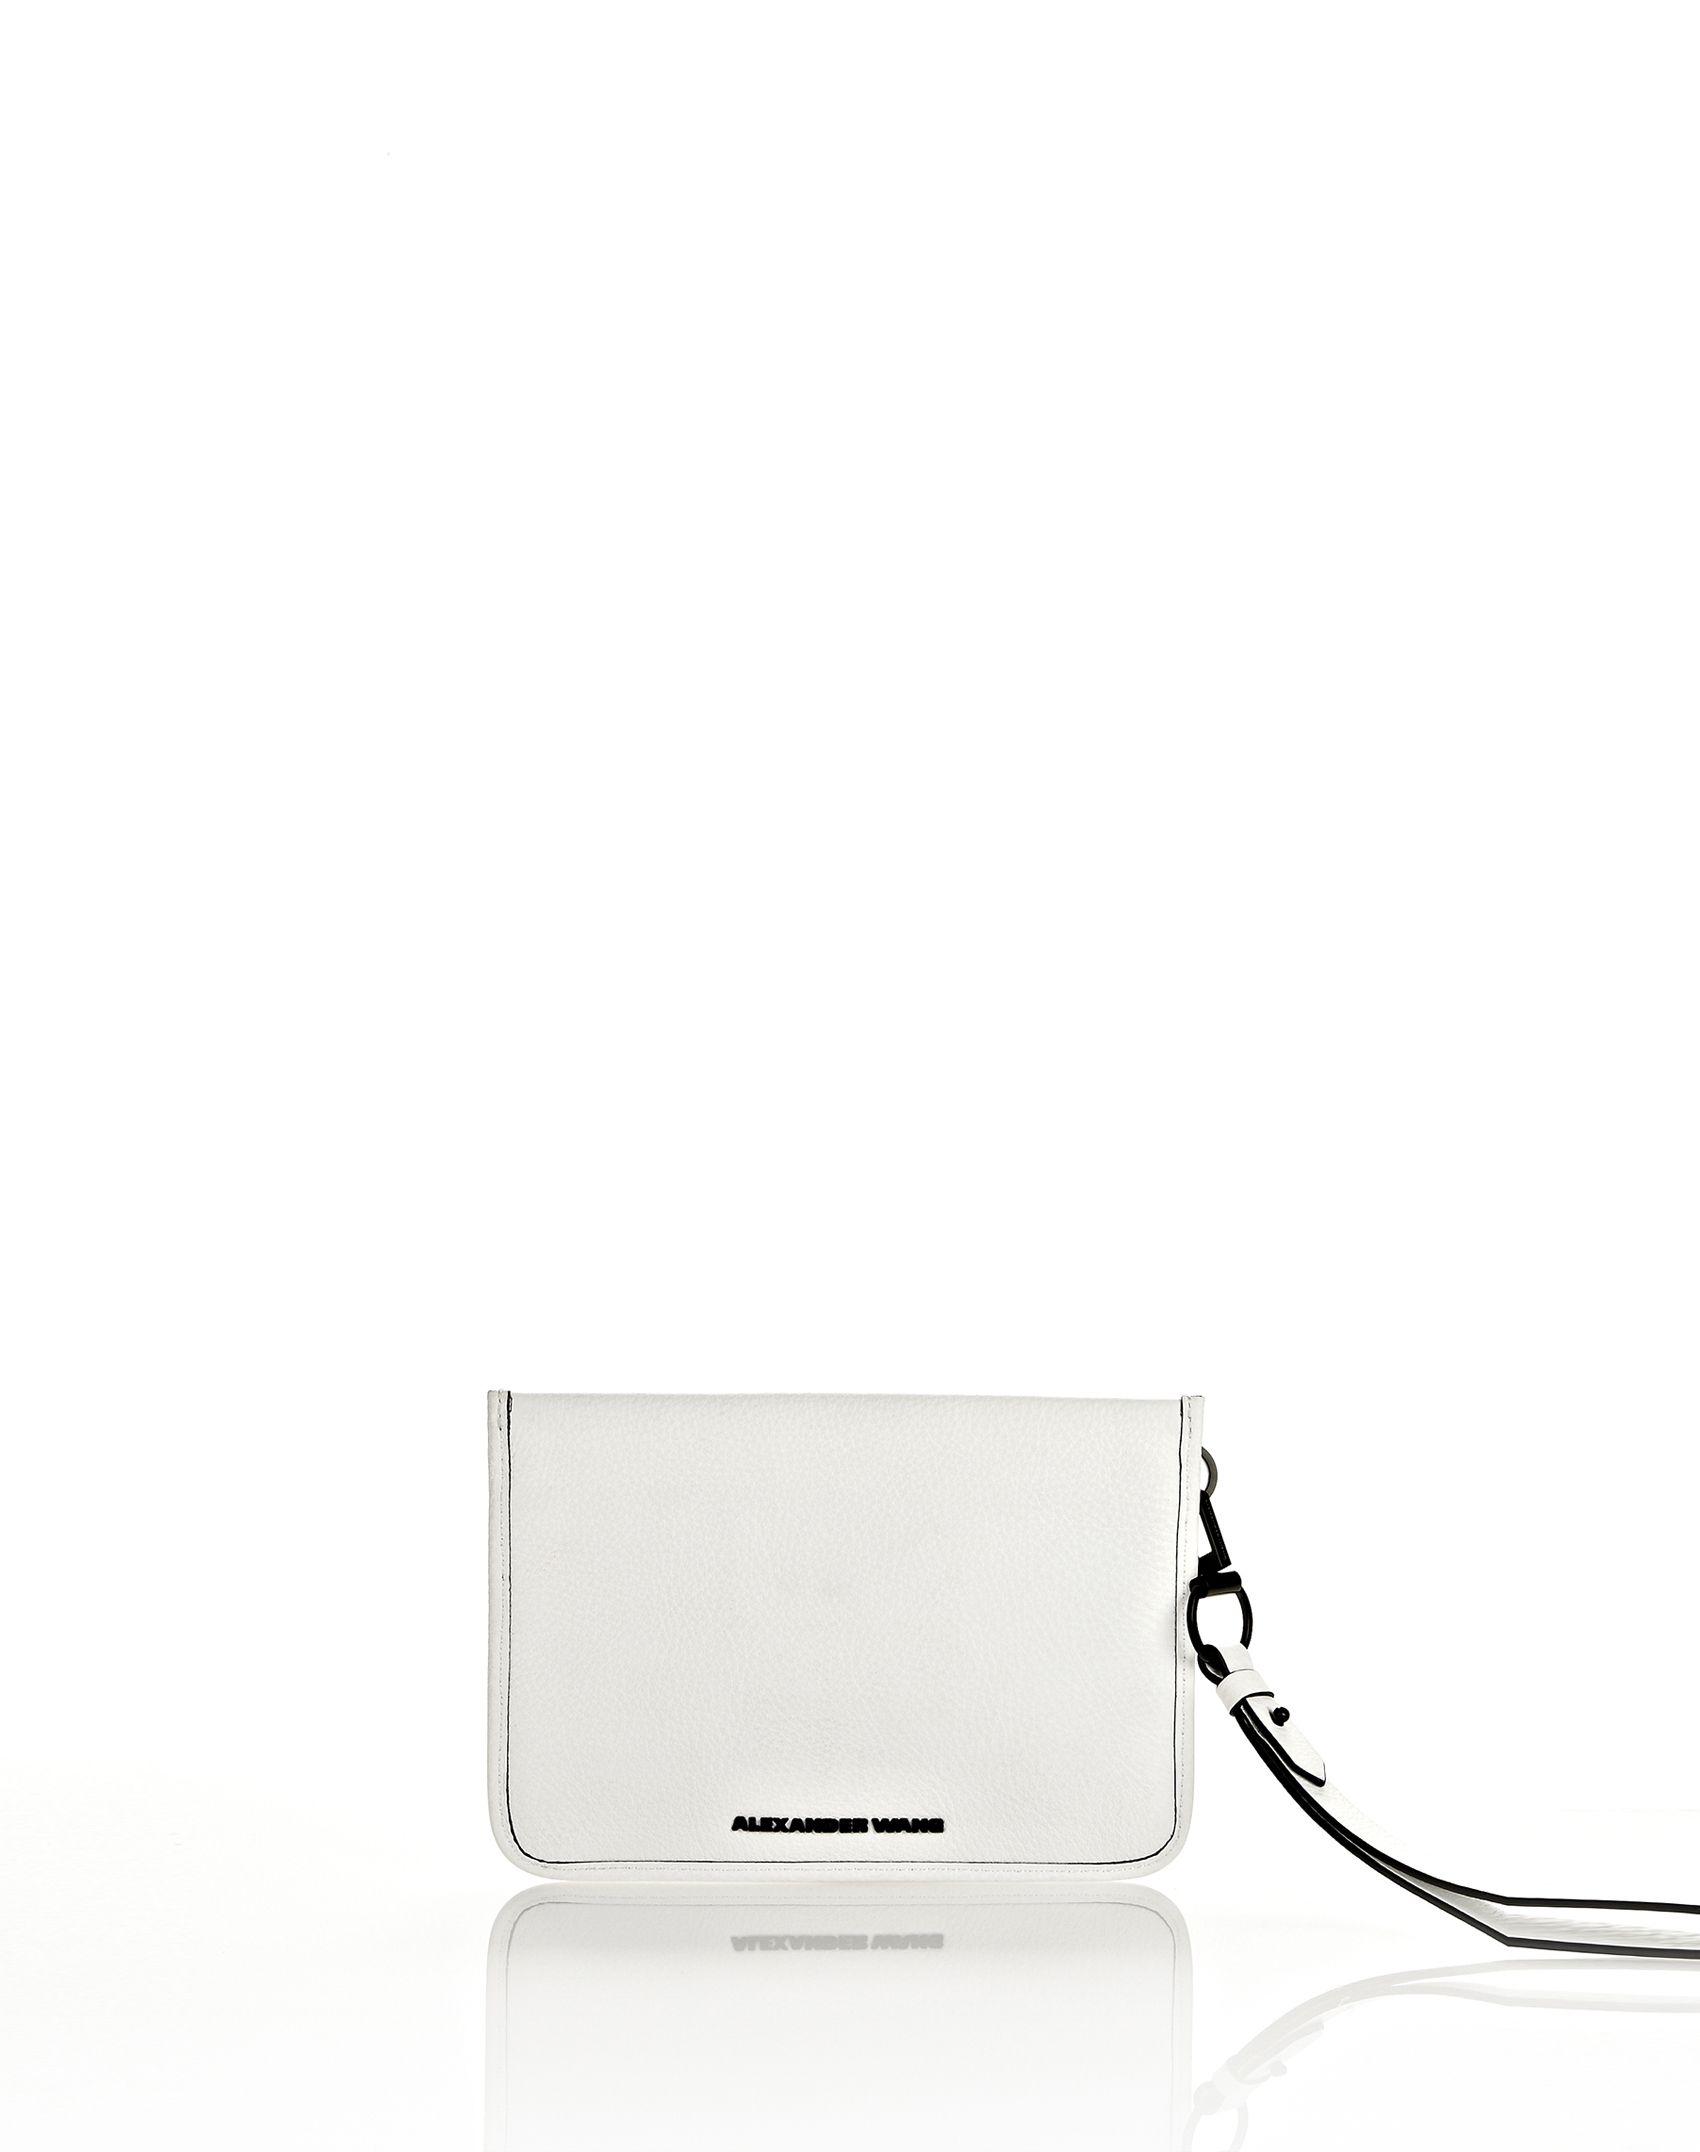 Alexander Wang Prisma Pochette Clutch in White with Matte Black ($260 Alexander Wang Shop)